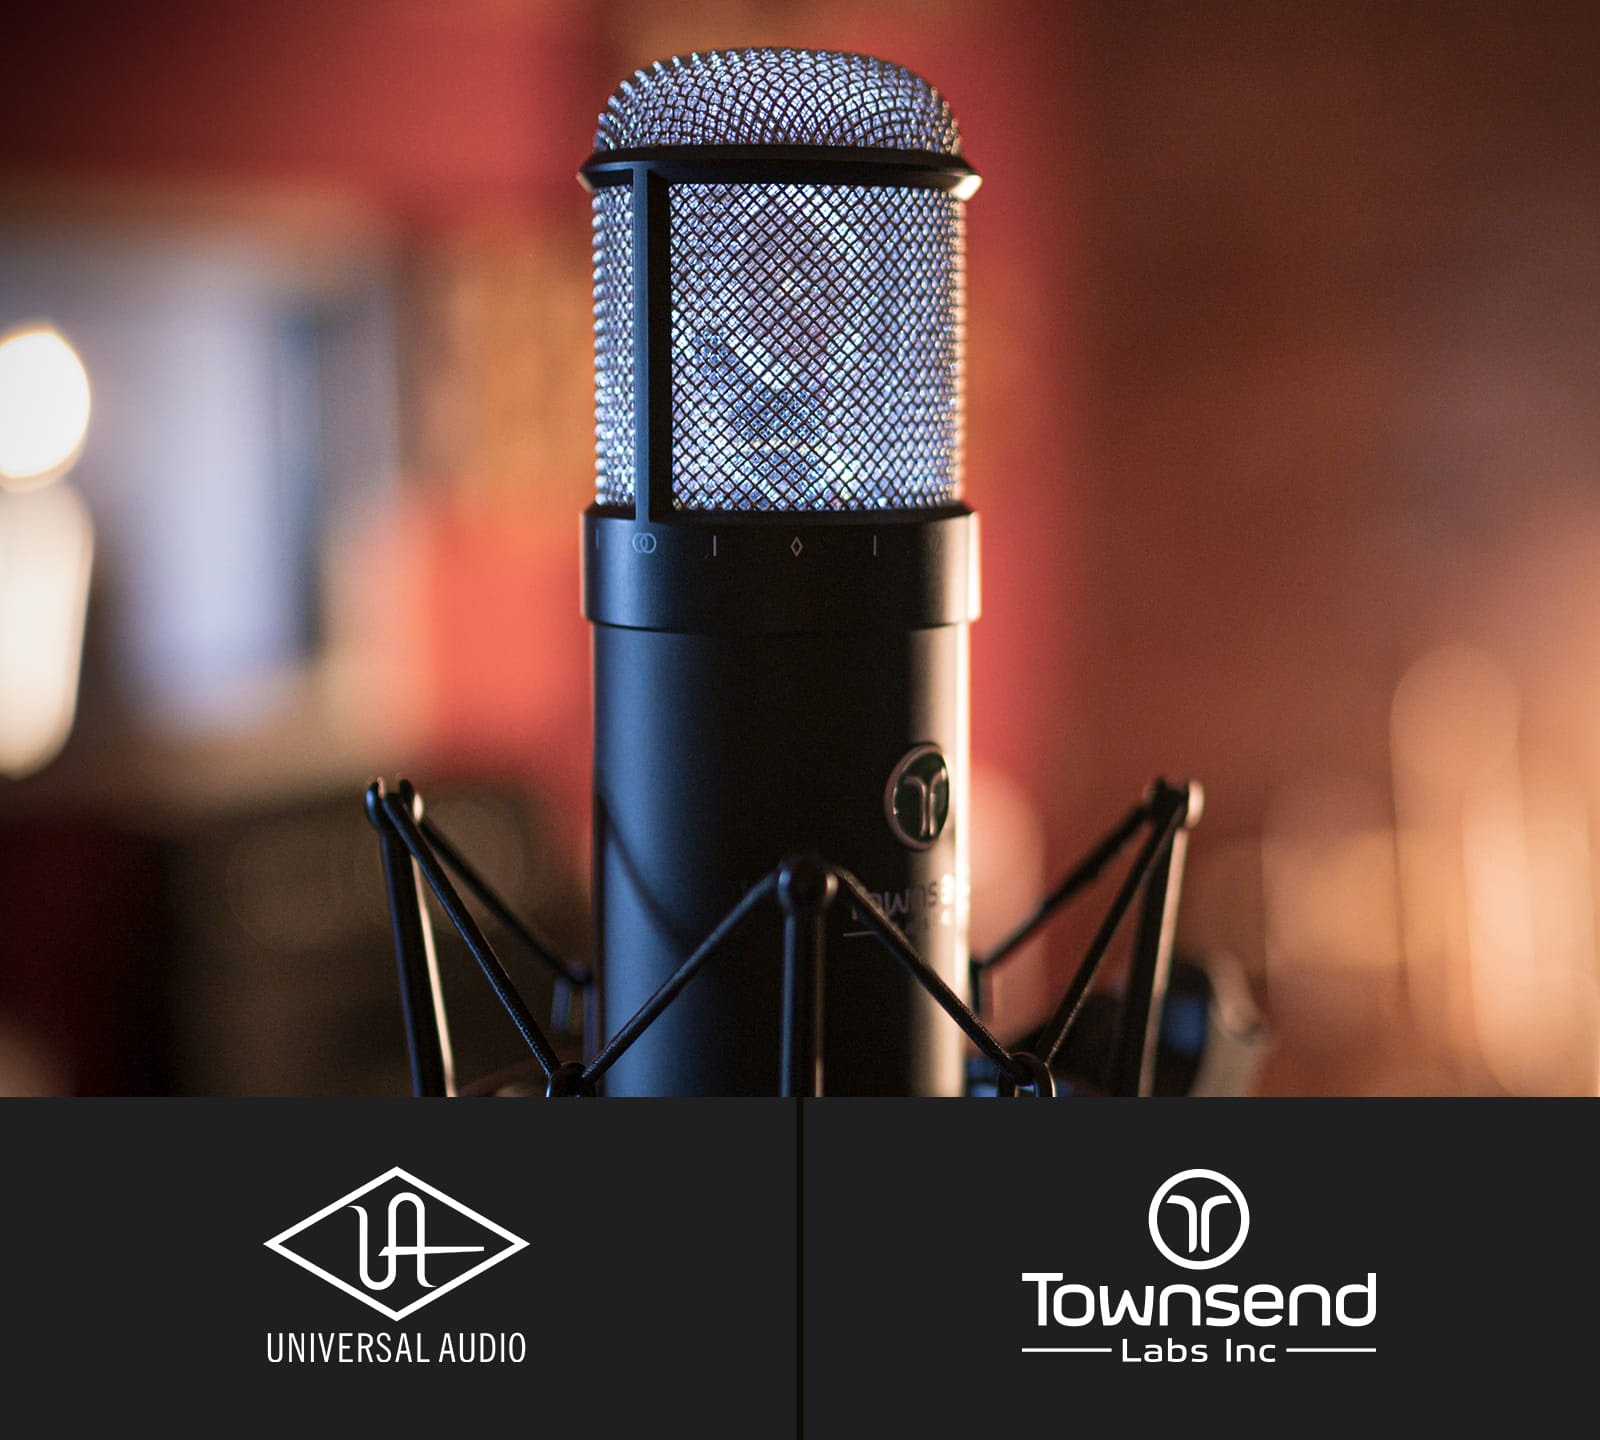 Universal Audio 宣布收购 Townsend Labs,将业界领先的麦克风建模技术收入囊中